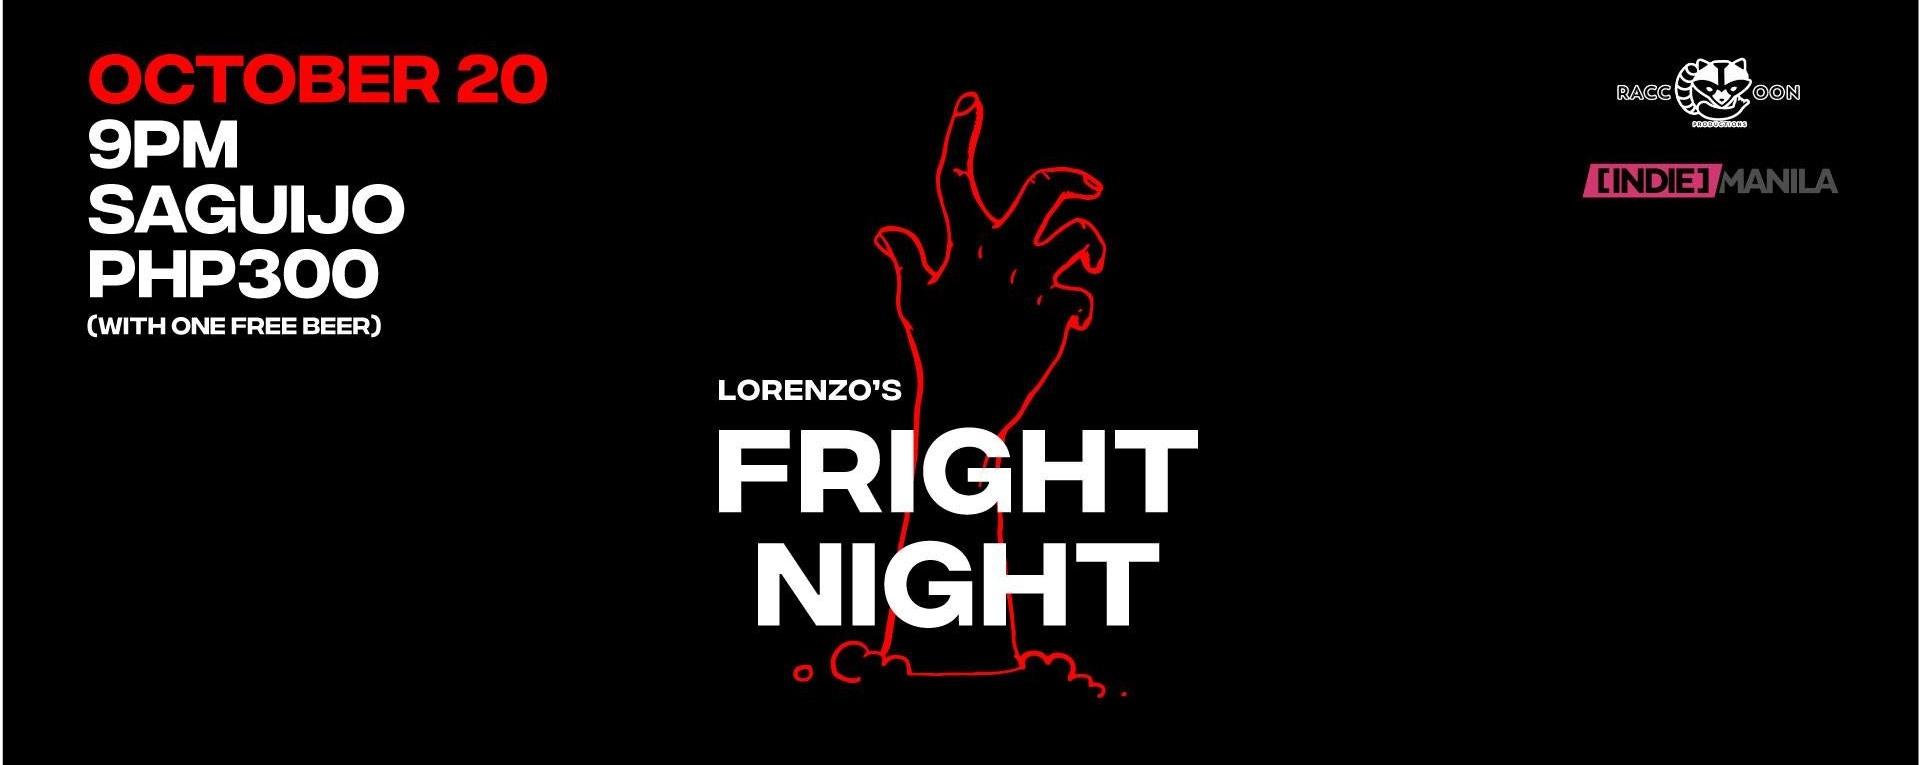 Fright Night at Saguijo